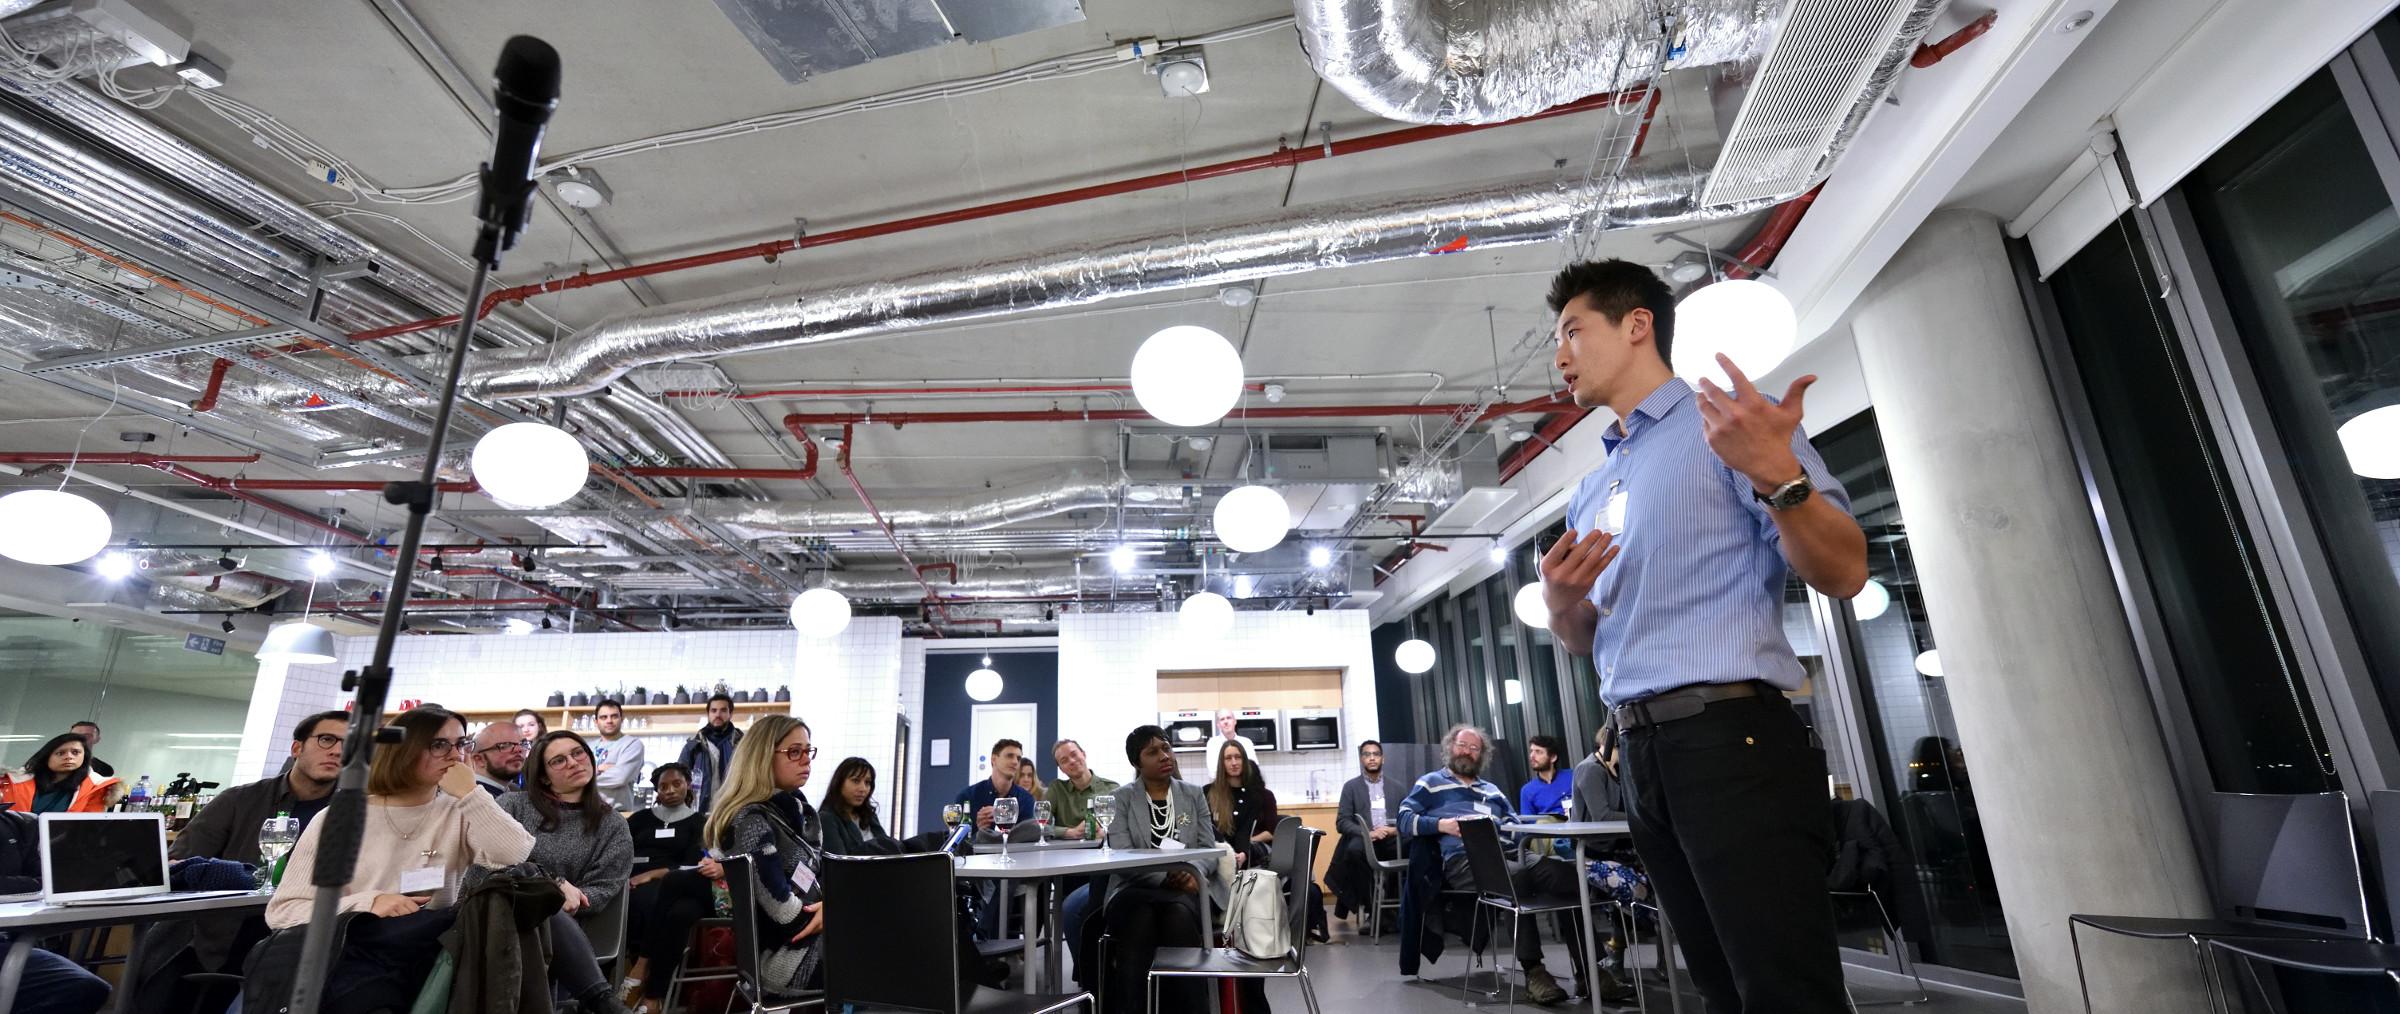 Hackathon-Day-1 Developed 10 MedTech Ventures Via A 6-month Venture Building Programme